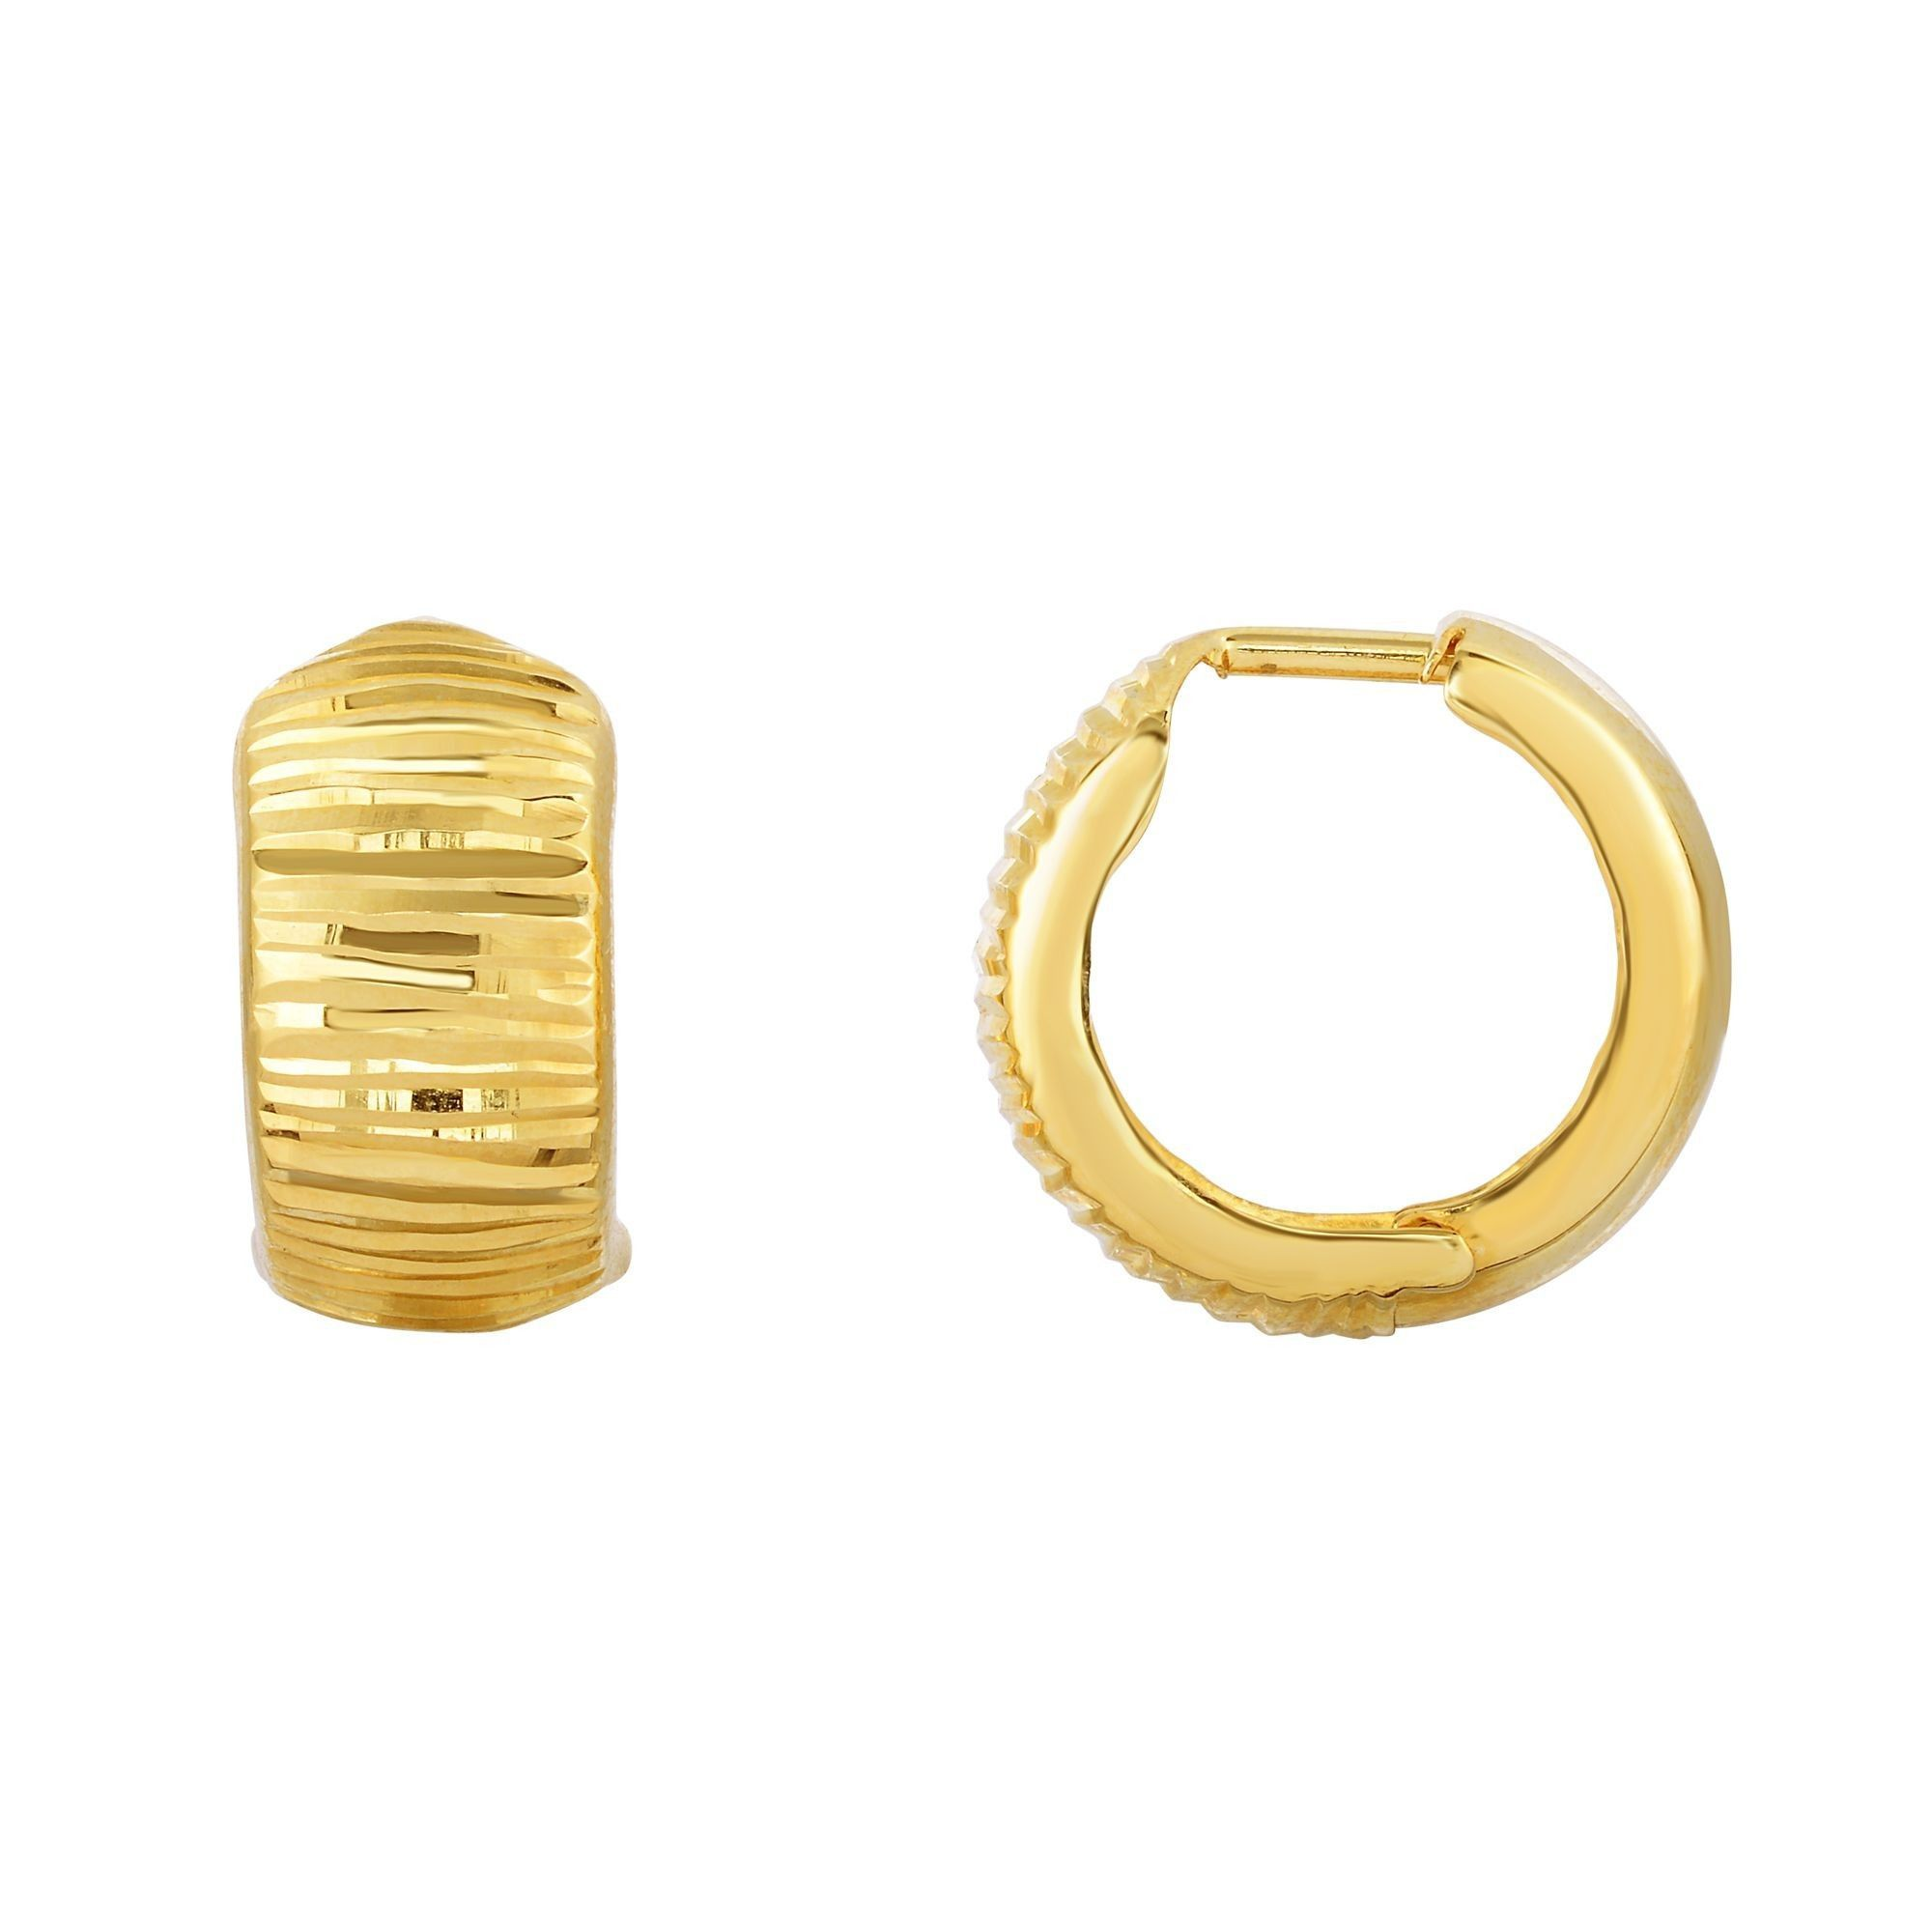 10K Gold Half Shiny & Half Diamond Cut Huggie Earring